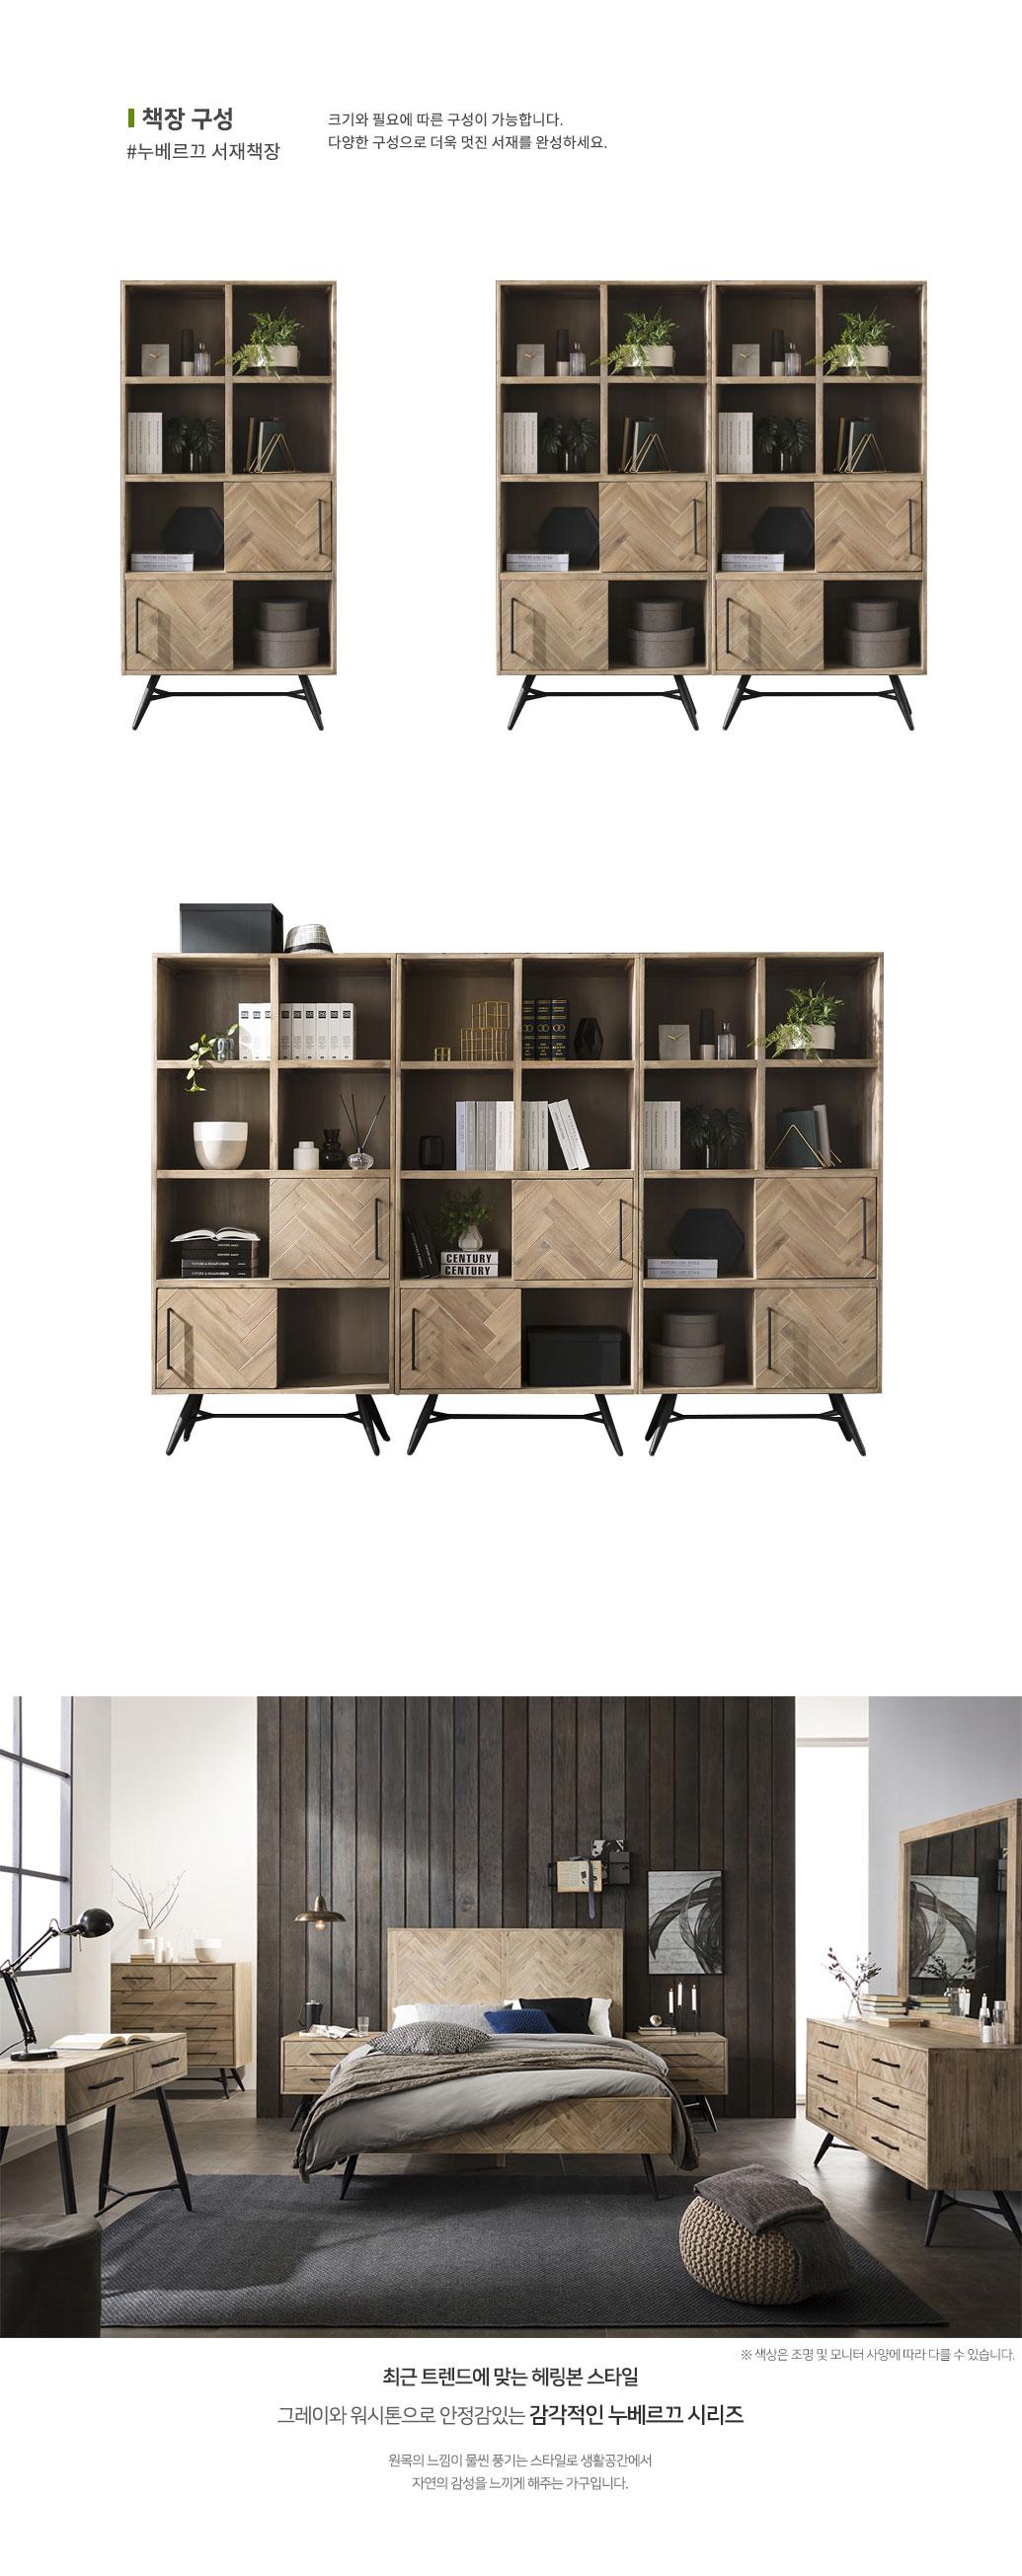 nouverc_bookcase_07.jpg